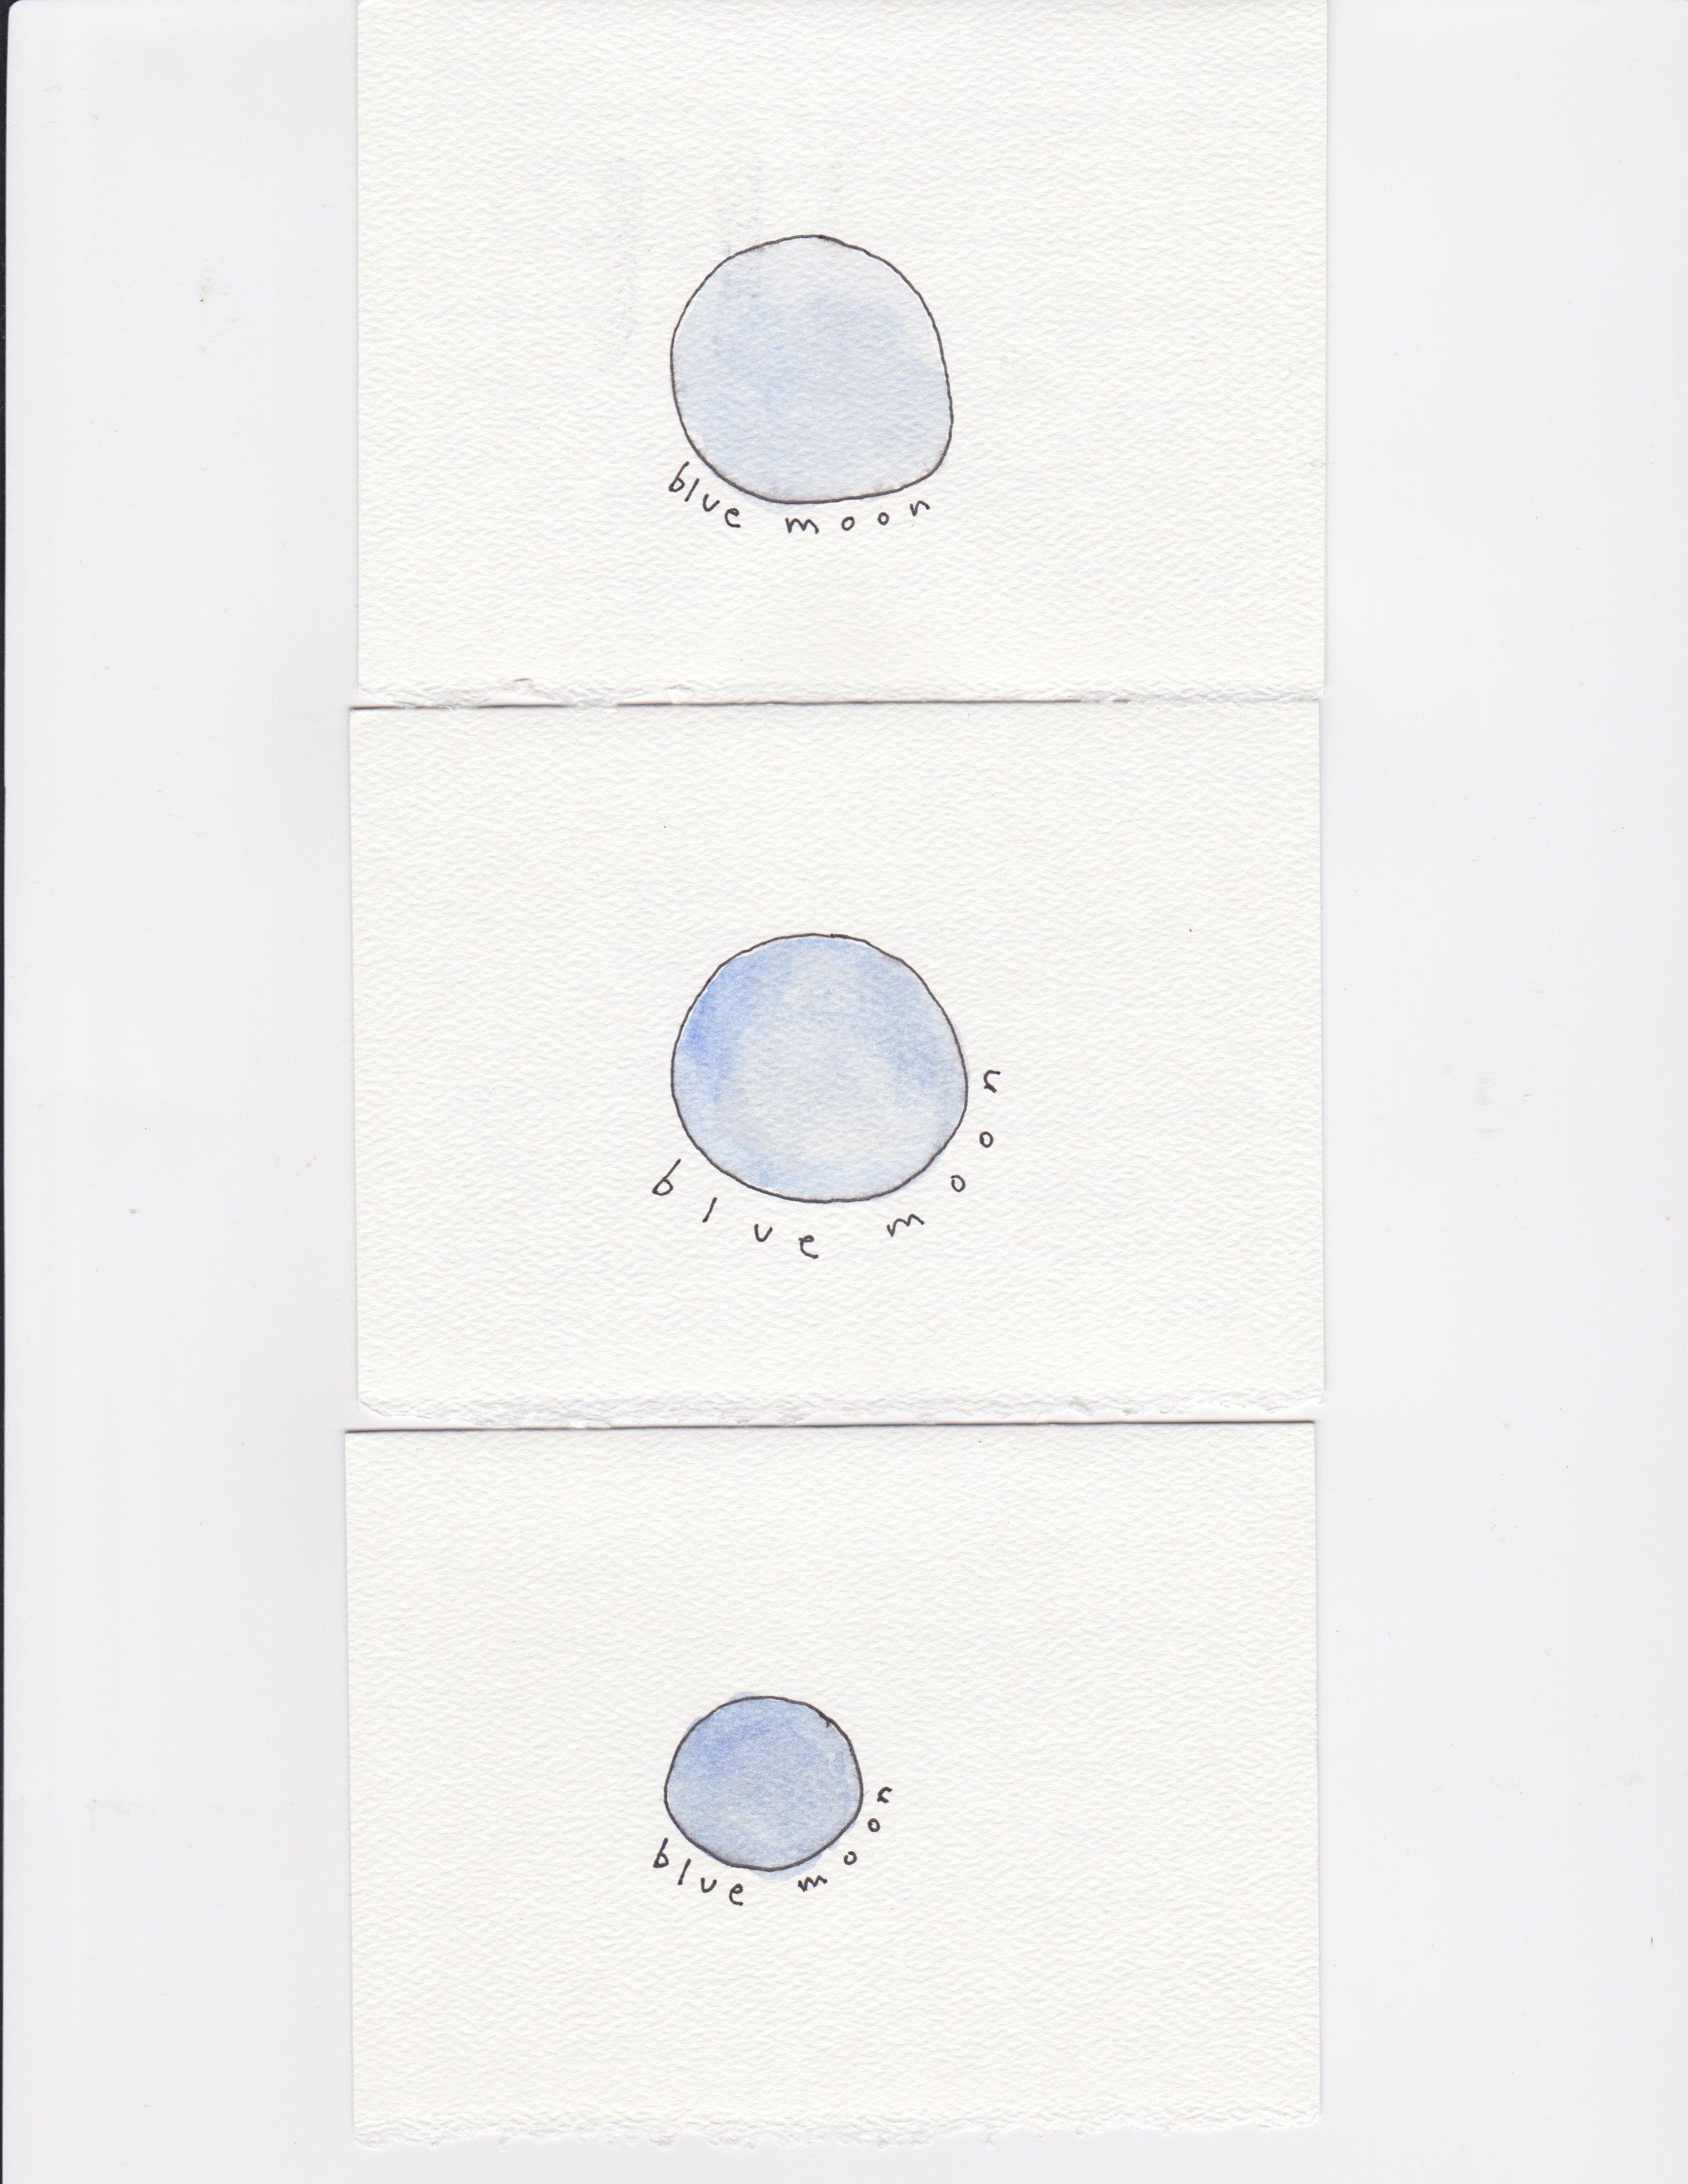 blue moon birthday 9.2012 copy.jpeg